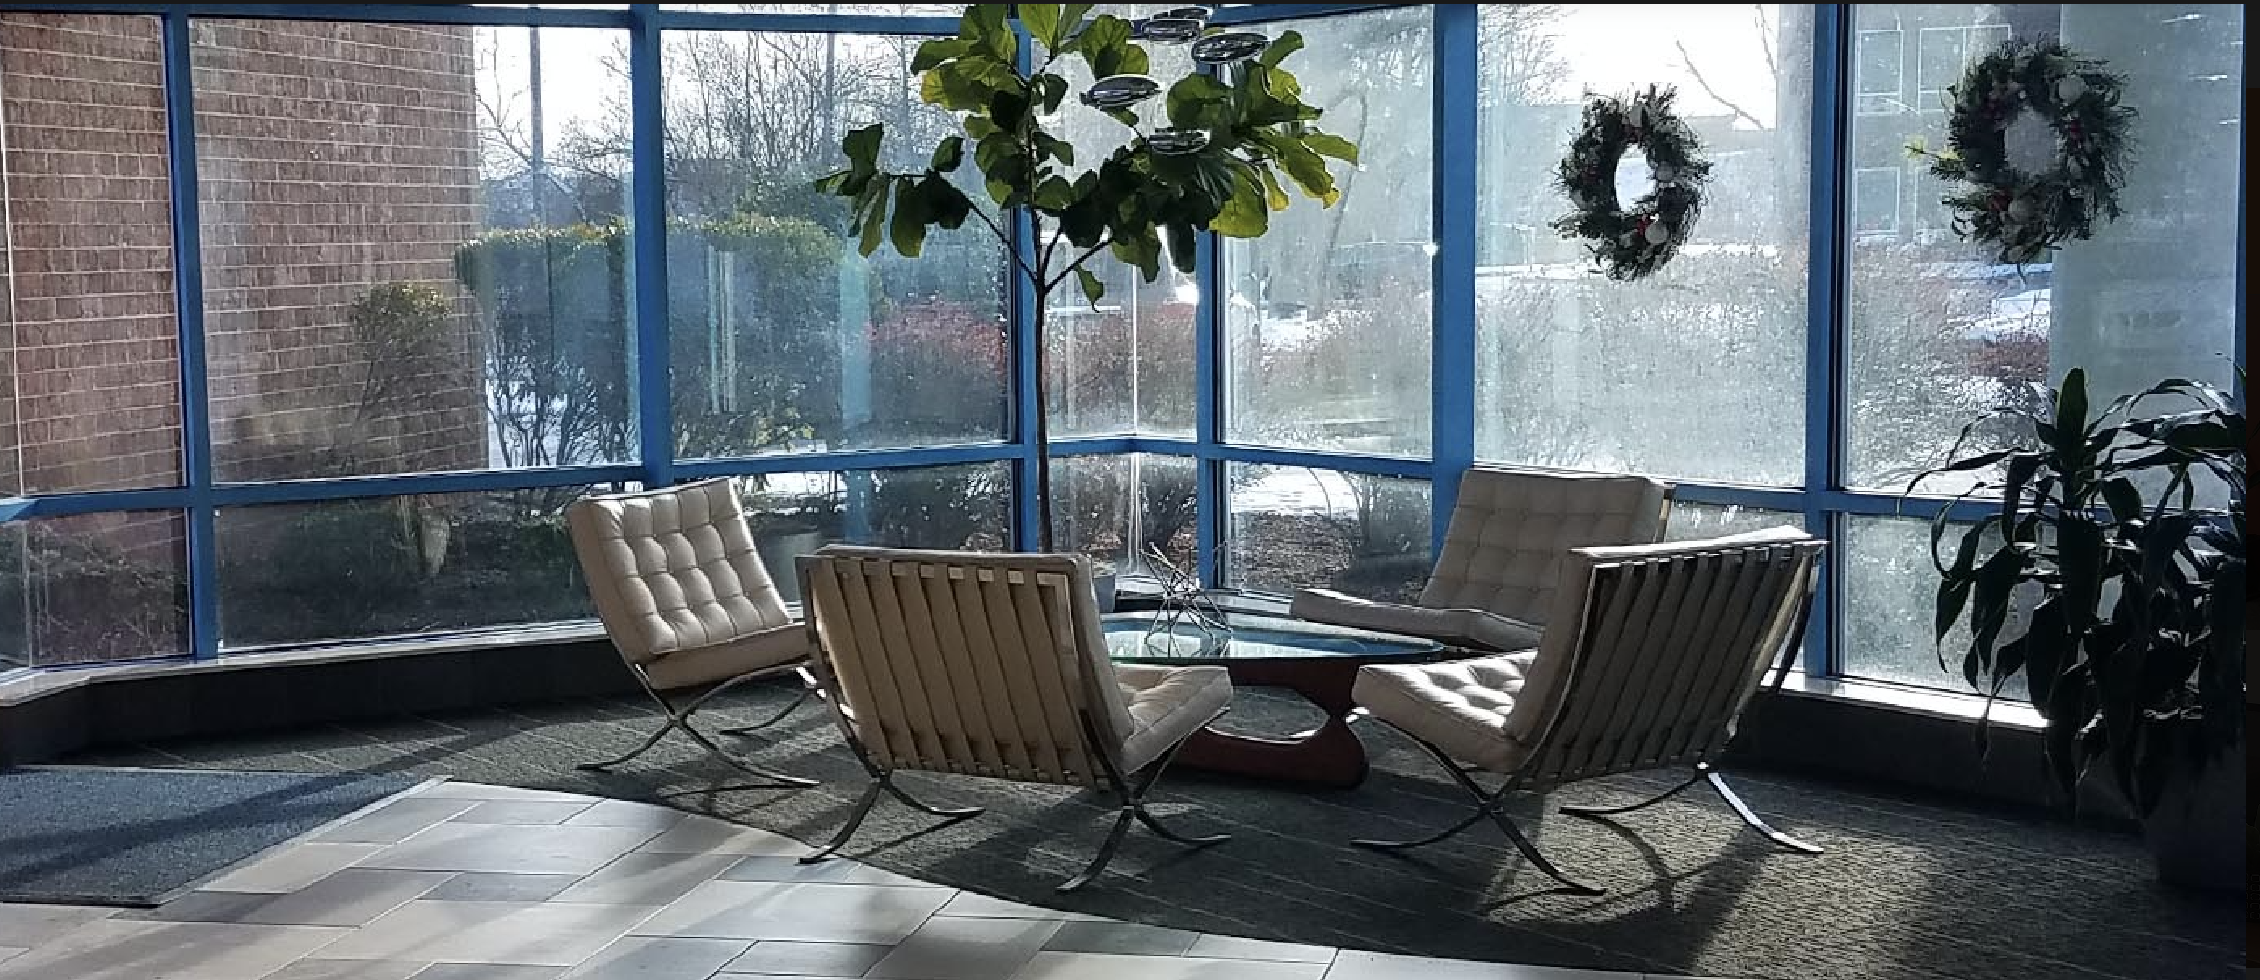 Office Evolution - Burlington, MA reviews | Shared Office Spaces at 2 Burlington Woods Drive - Burlington MA